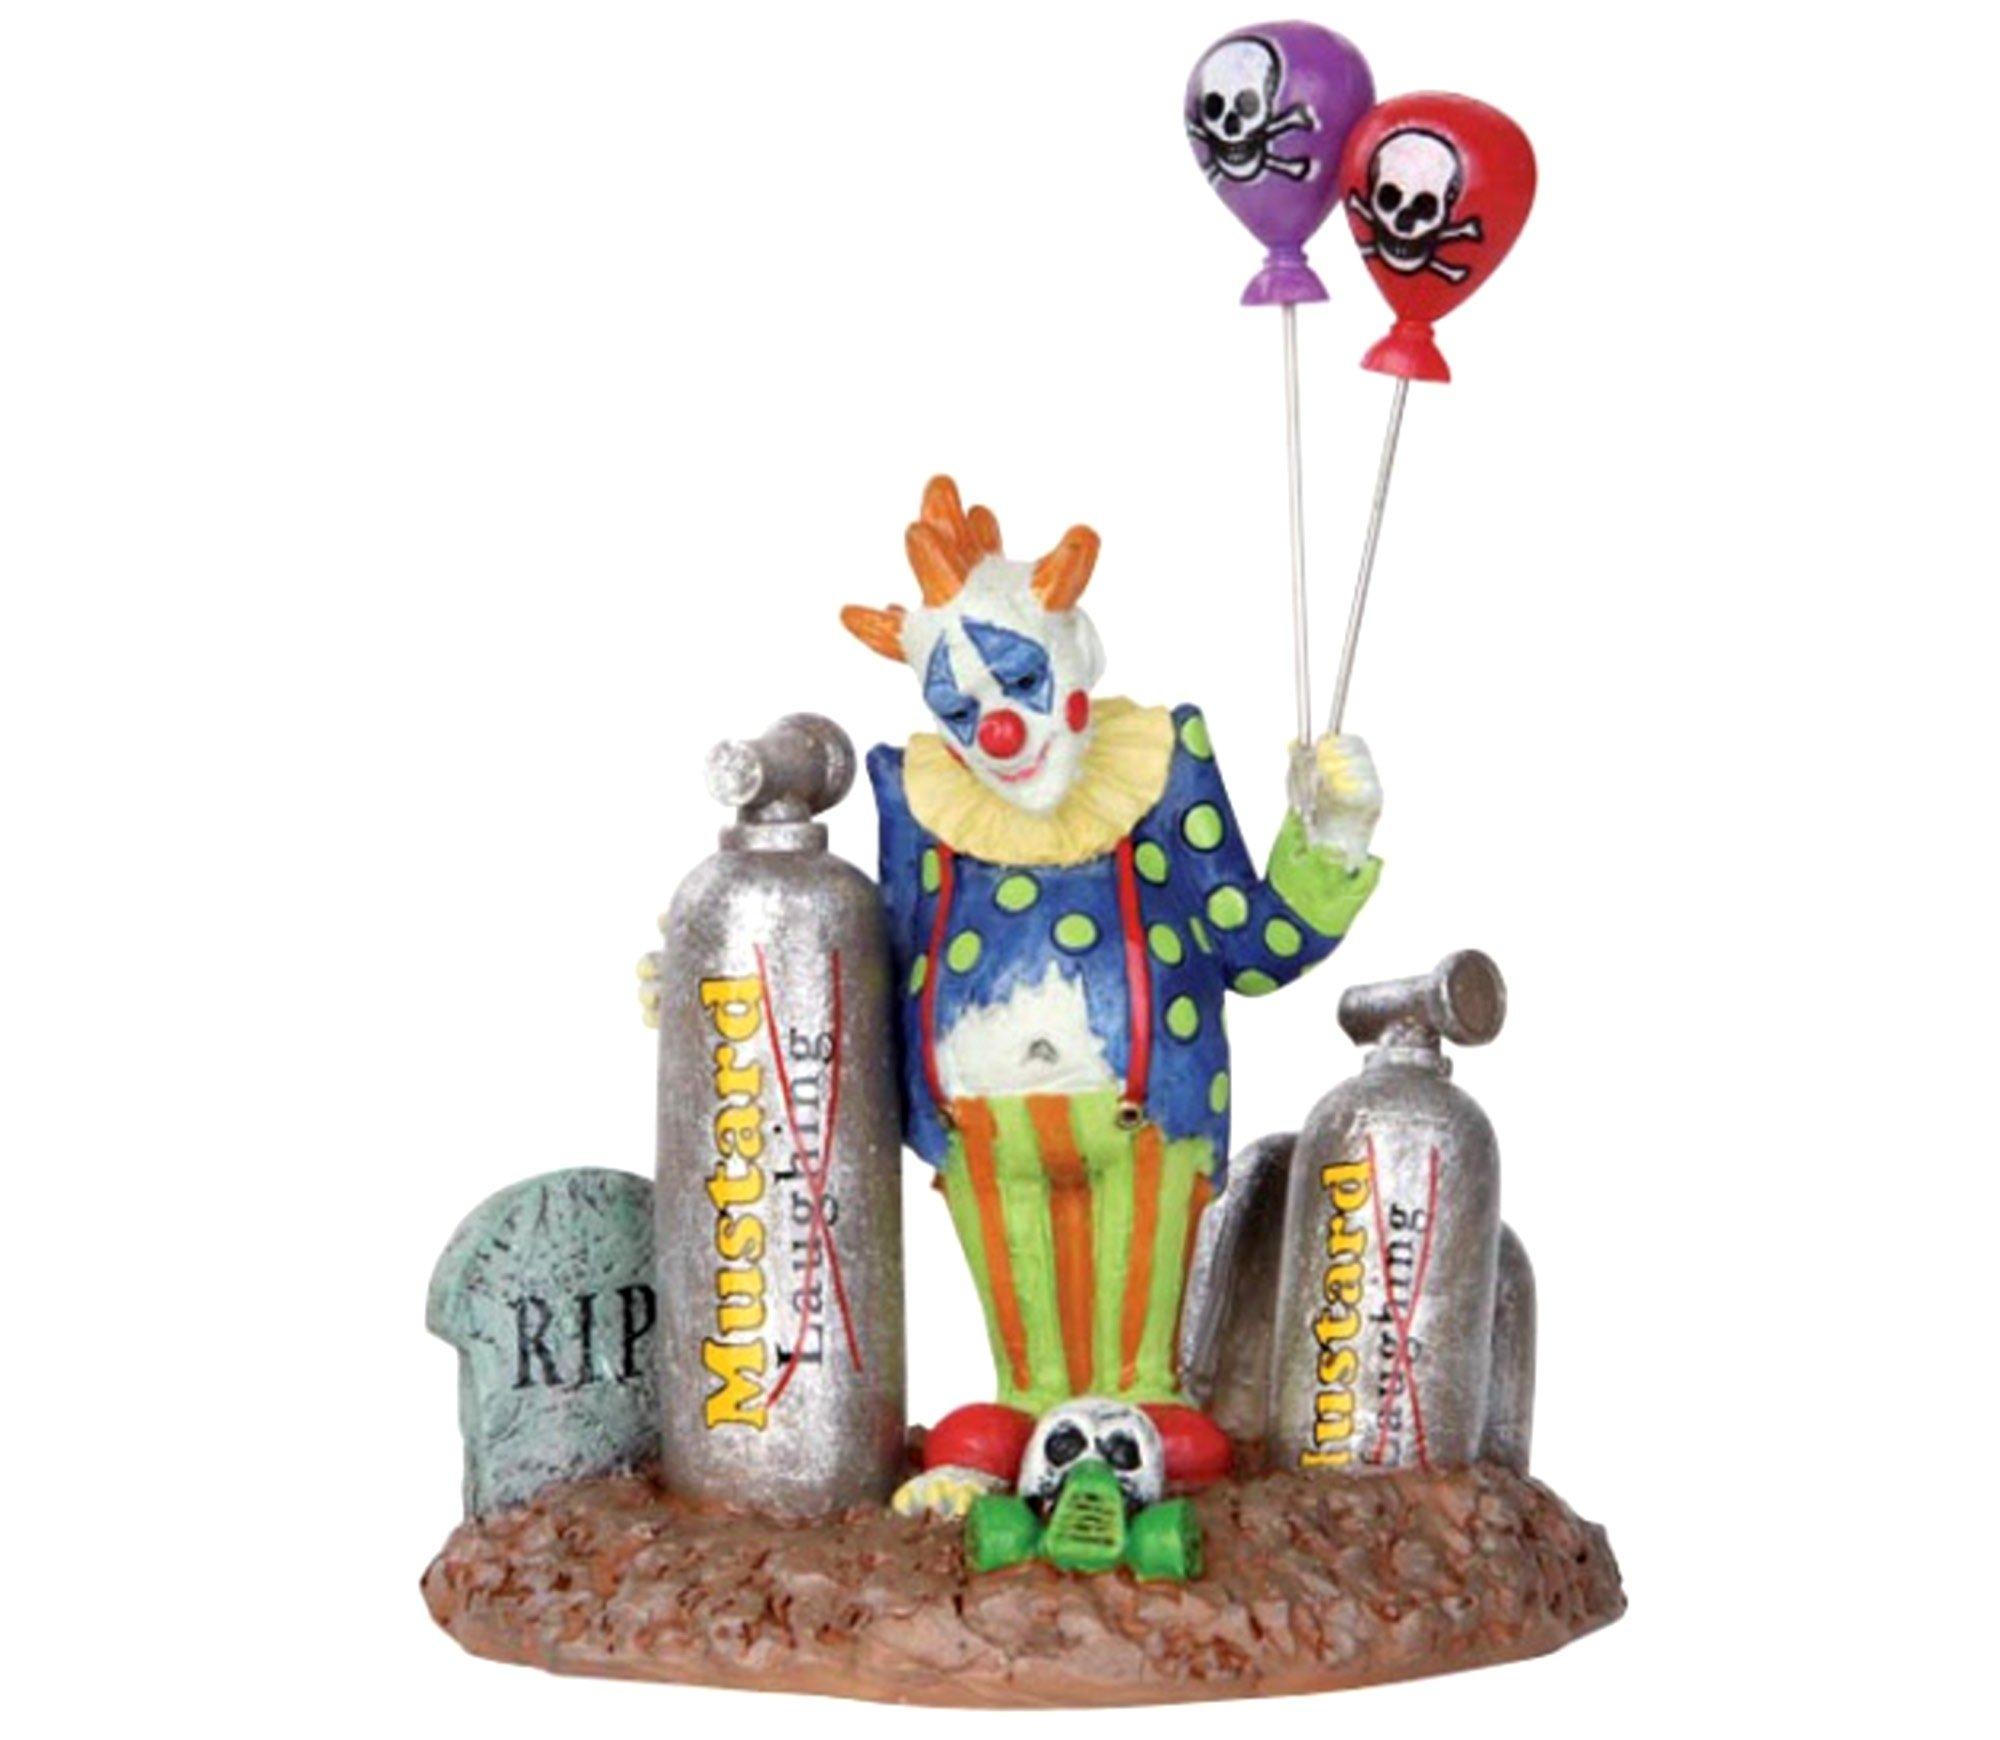 1 X Lemax 32103 Balloon Clown Spooky Town Figure Halloween Decor Figurine